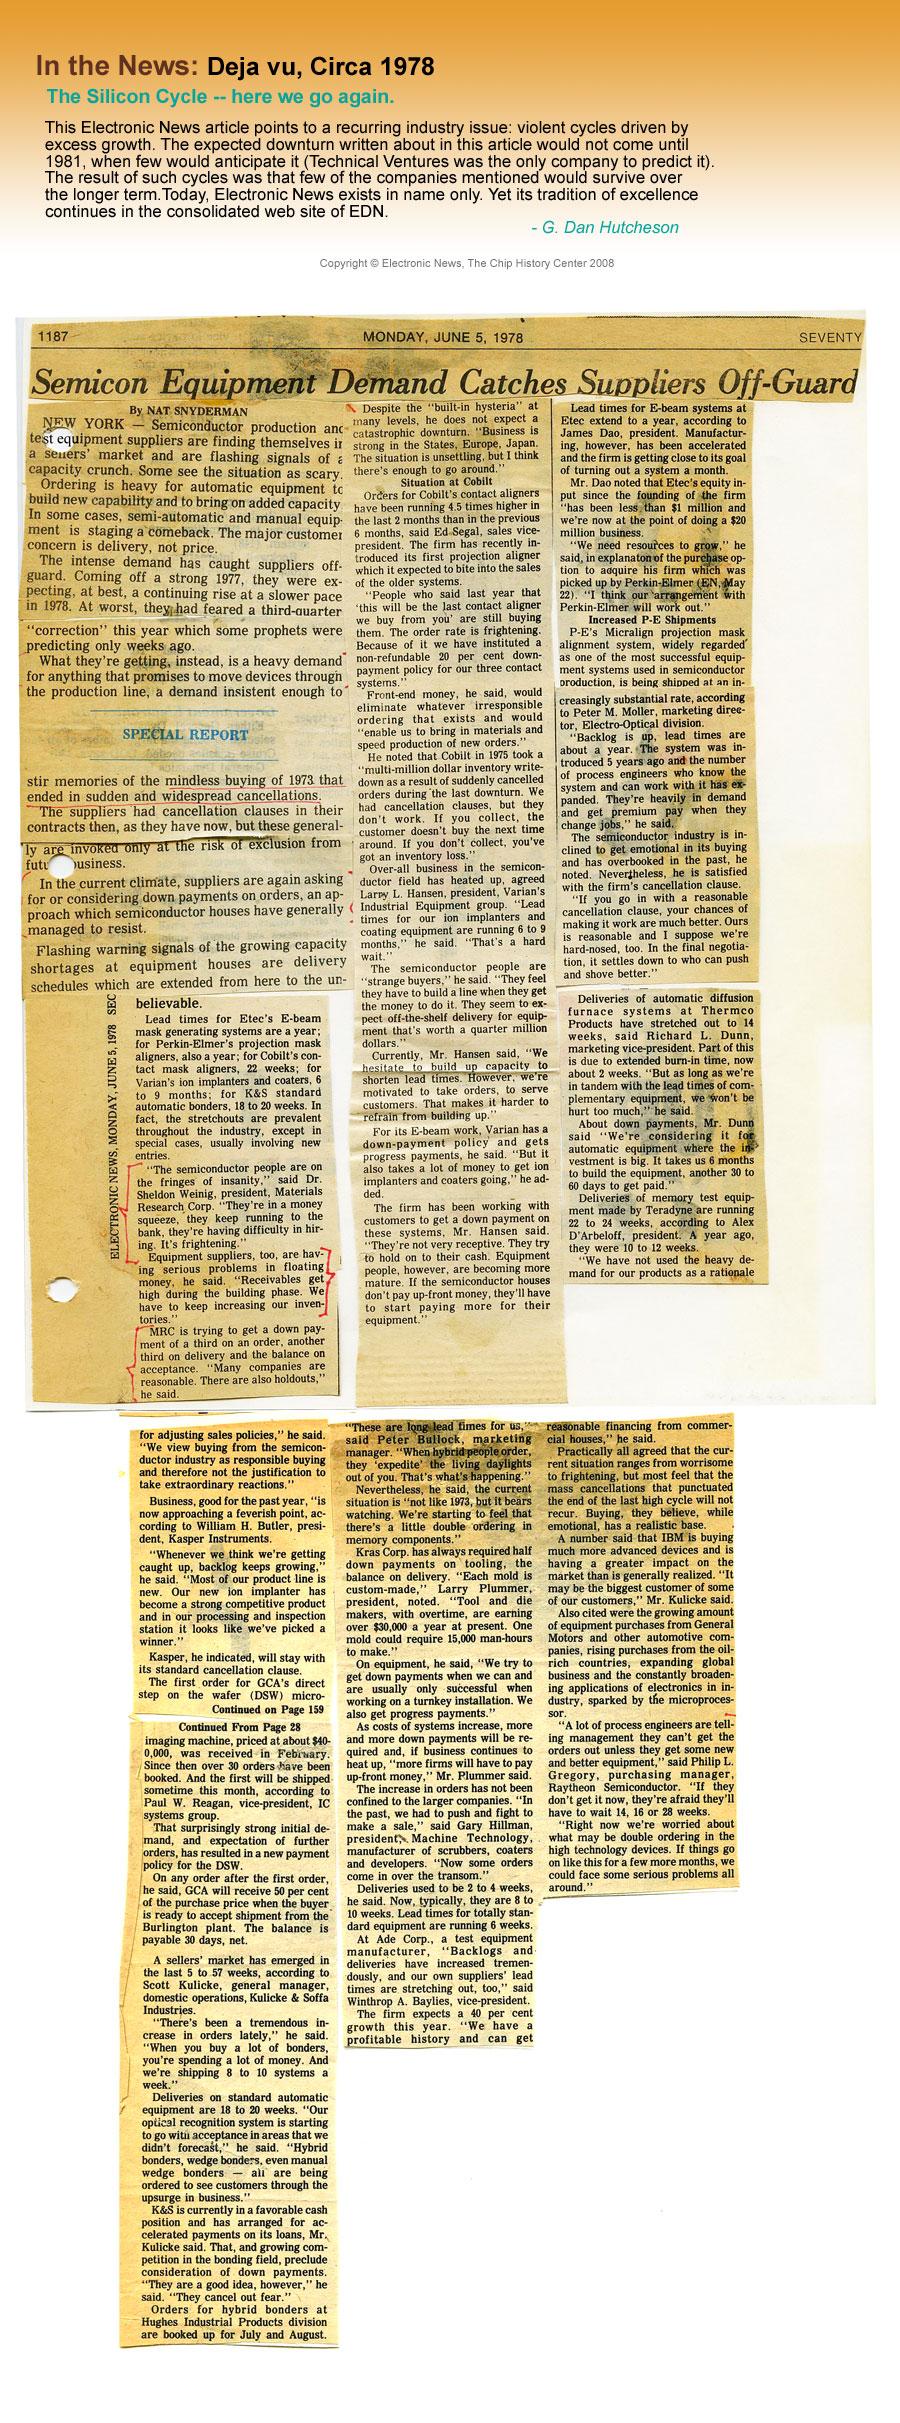 In the News: Deja vu, Circa 1978